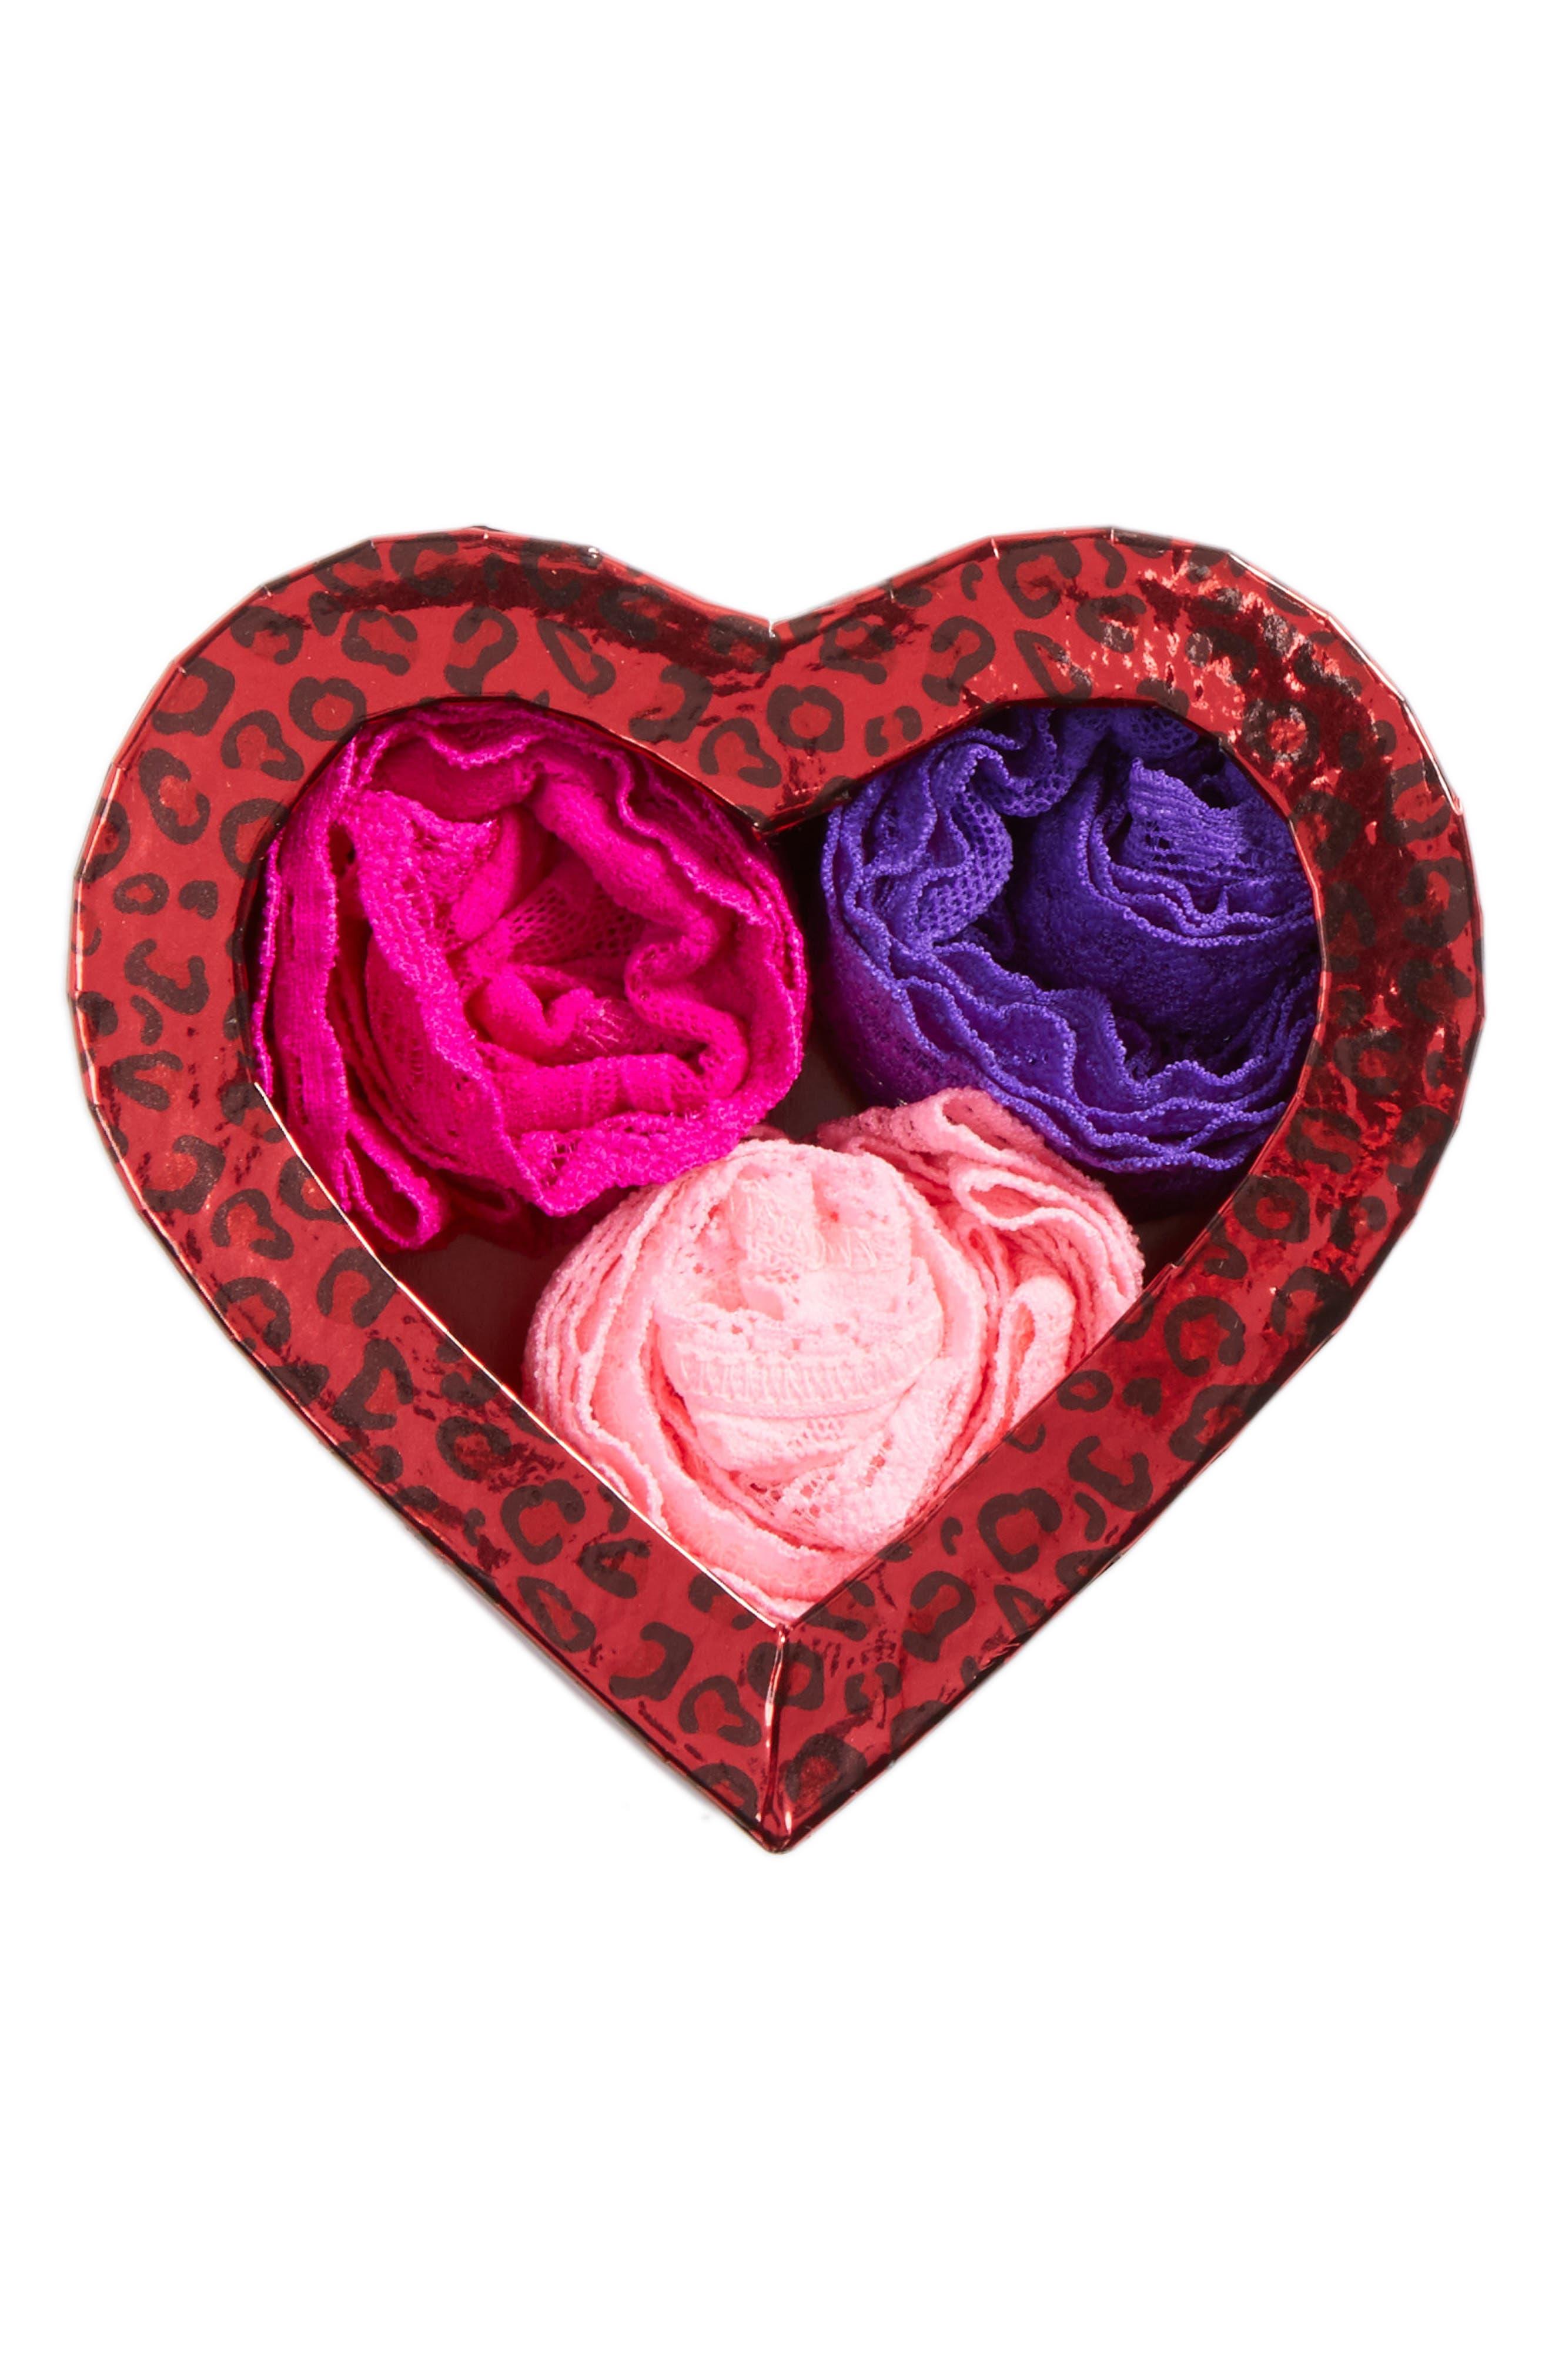 'Hugs N Kisses' Boxed Low Rise Thongs,                             Alternate thumbnail 2, color,                             651